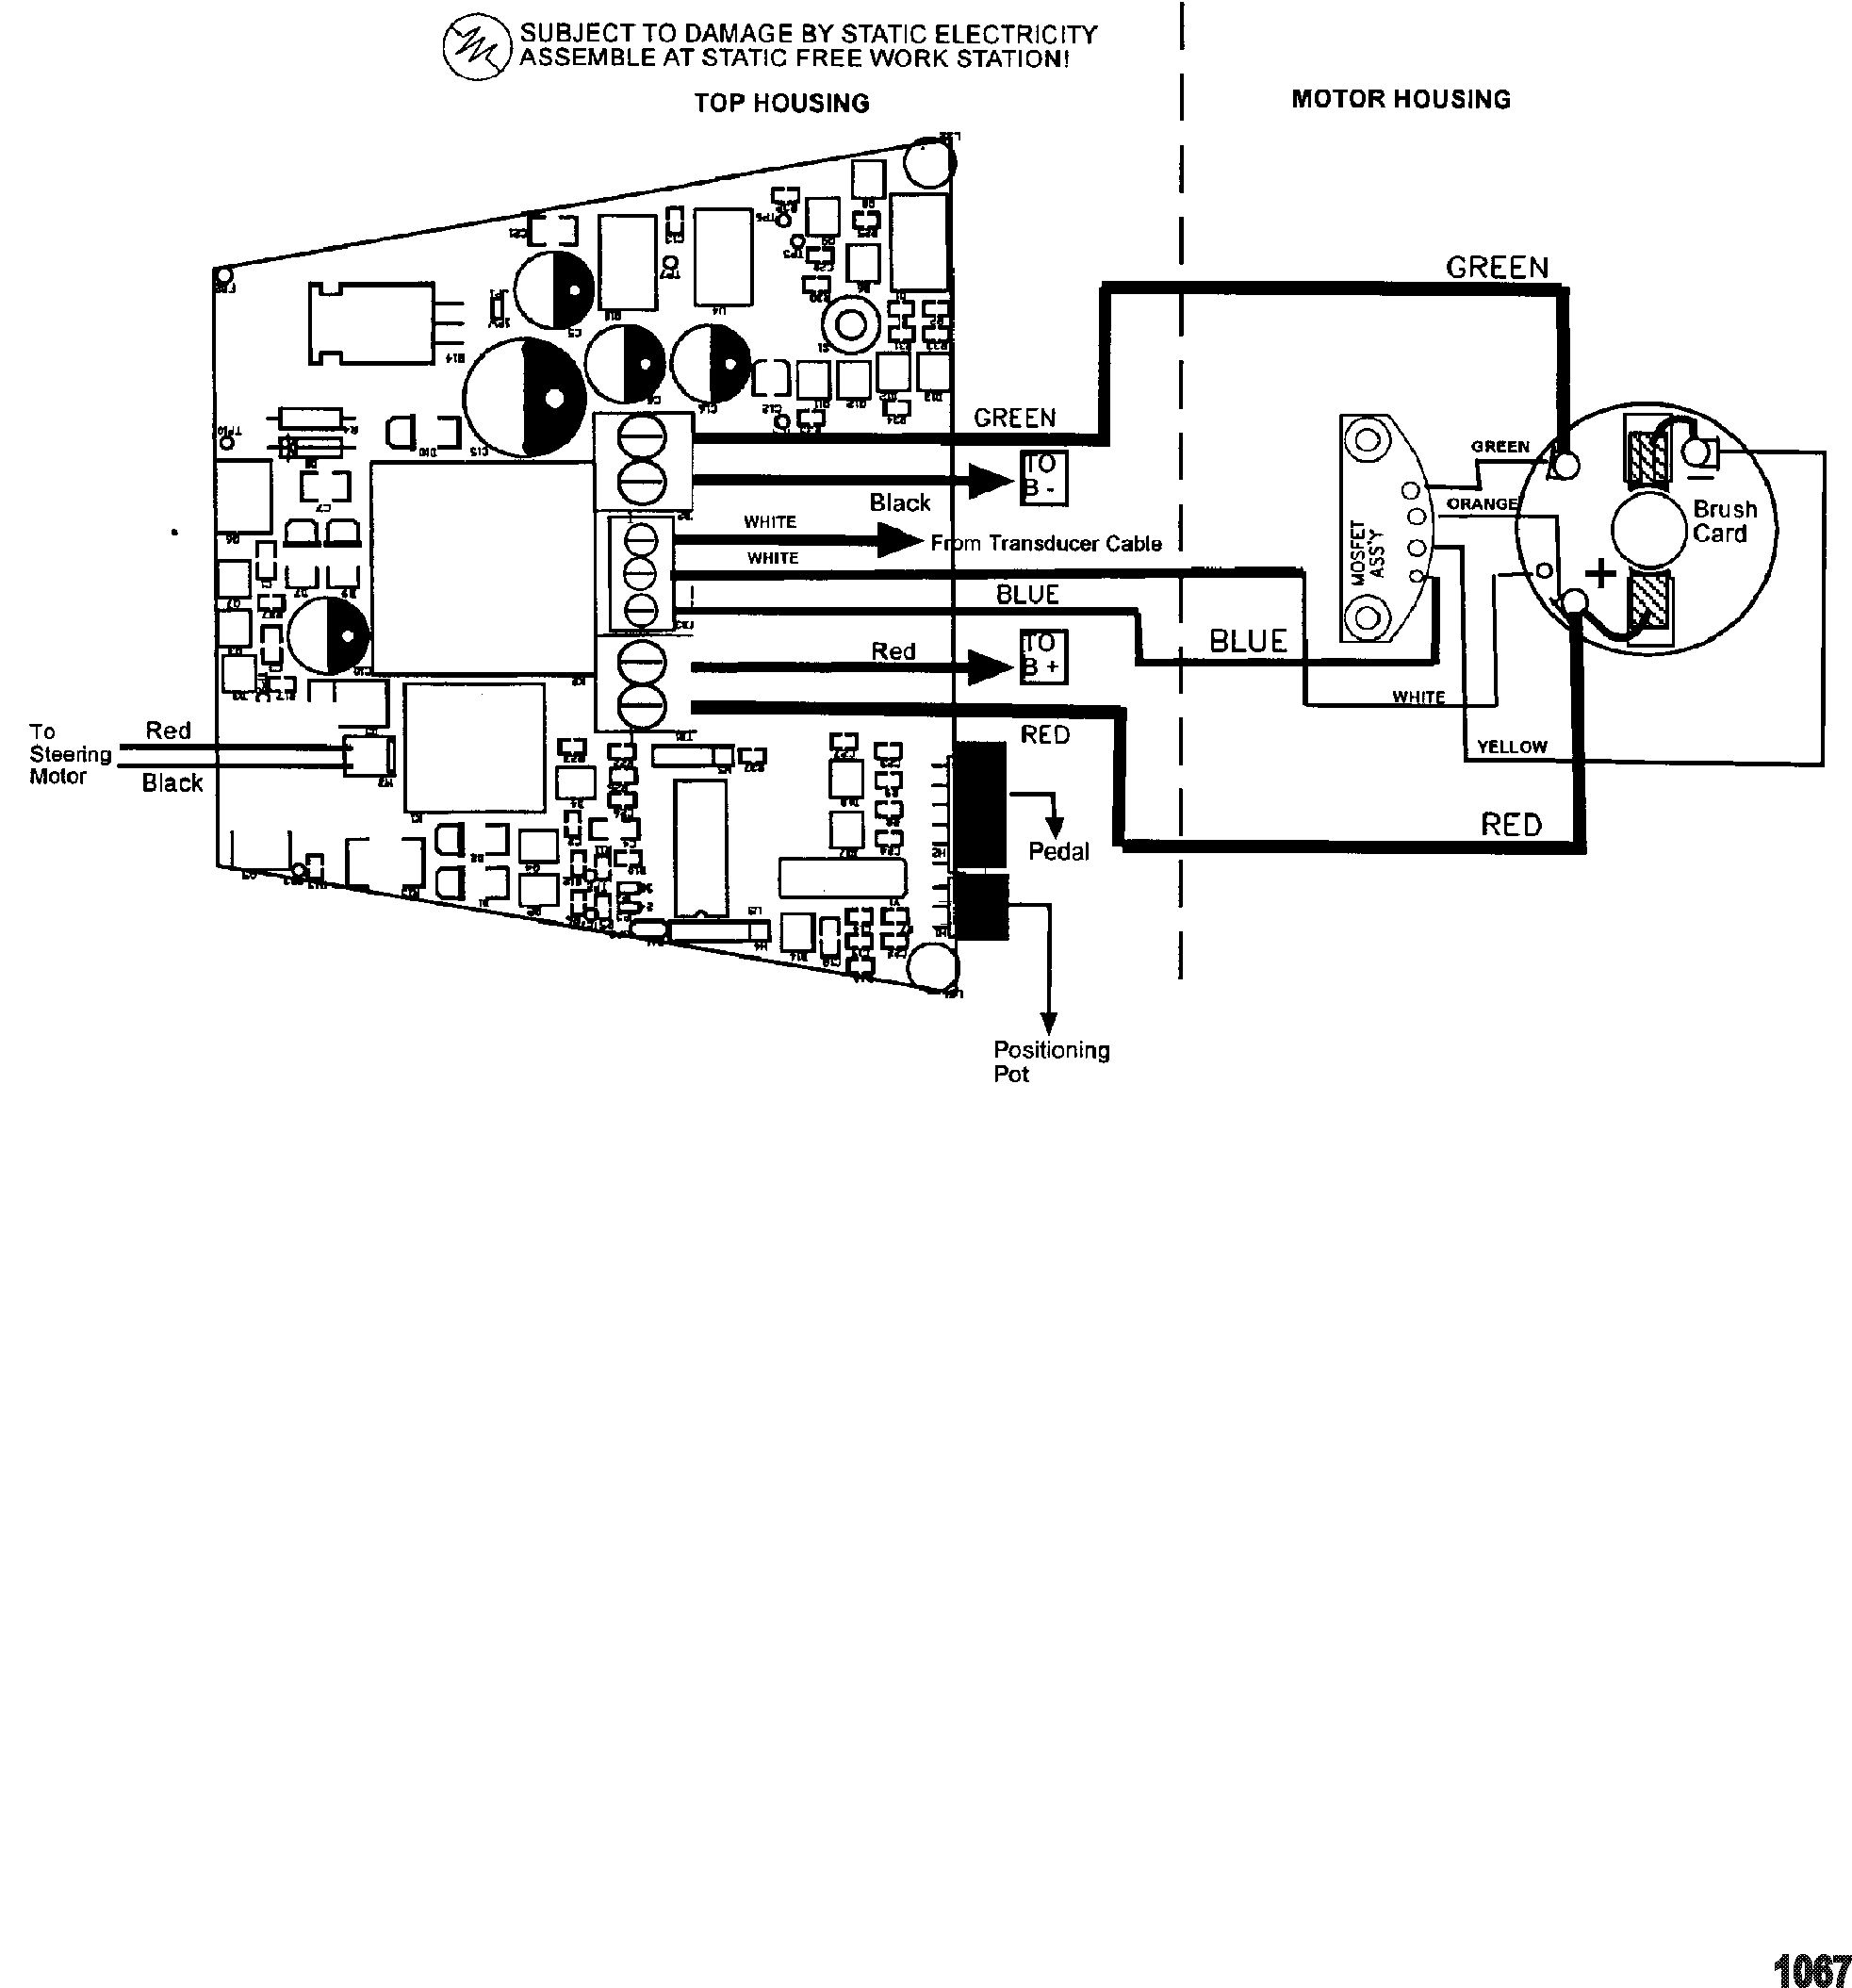 ch_0299] motorguide trolling motor 36 volt wiring diagram free diagram  semec wigeg unpr boapu anist penghe arch joami mohammedshrine librar wiring  101